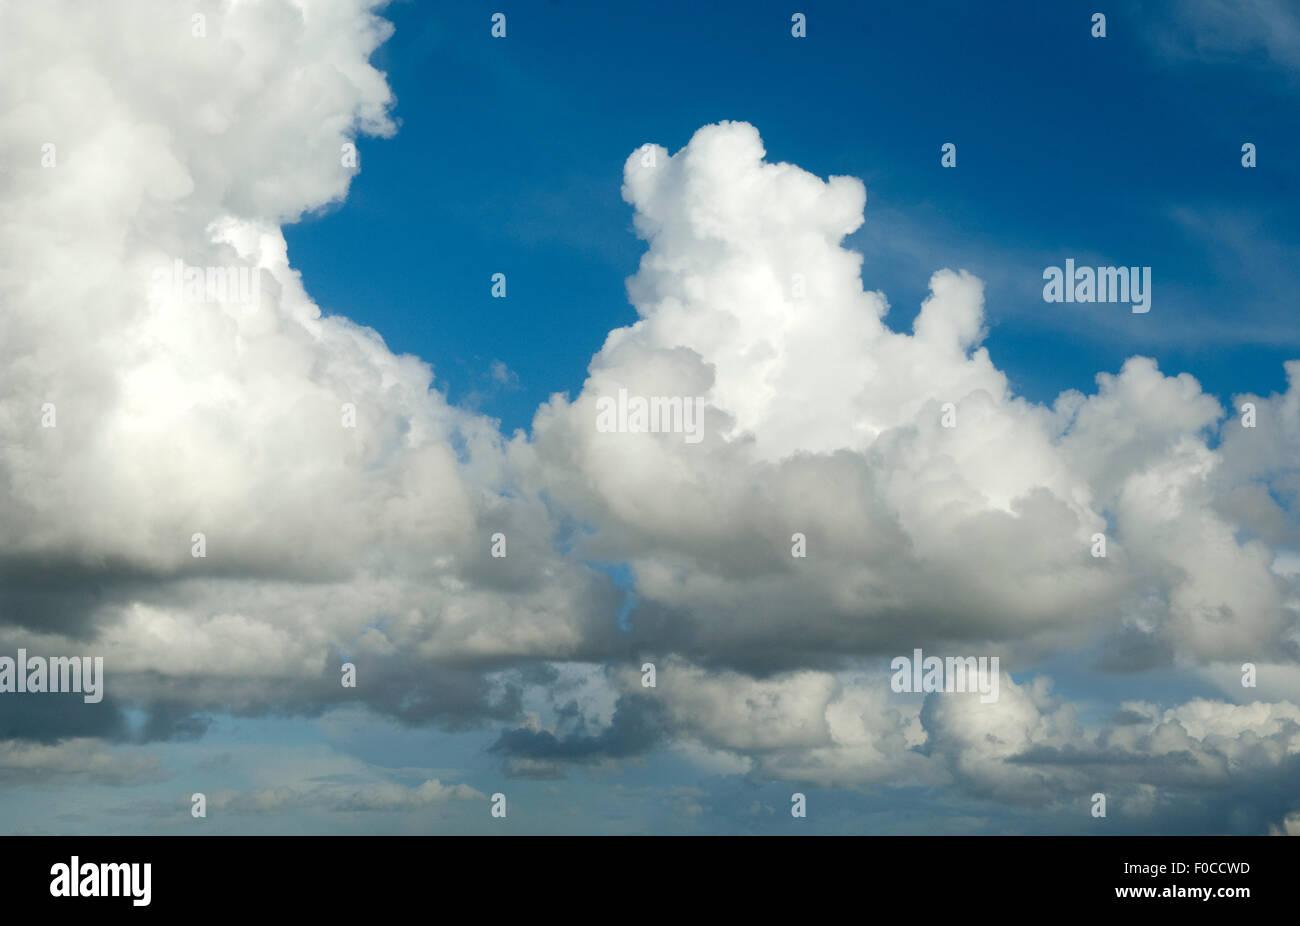 wolken, Blau Konvektionswolken; Blauer Himmel; - Stock Image